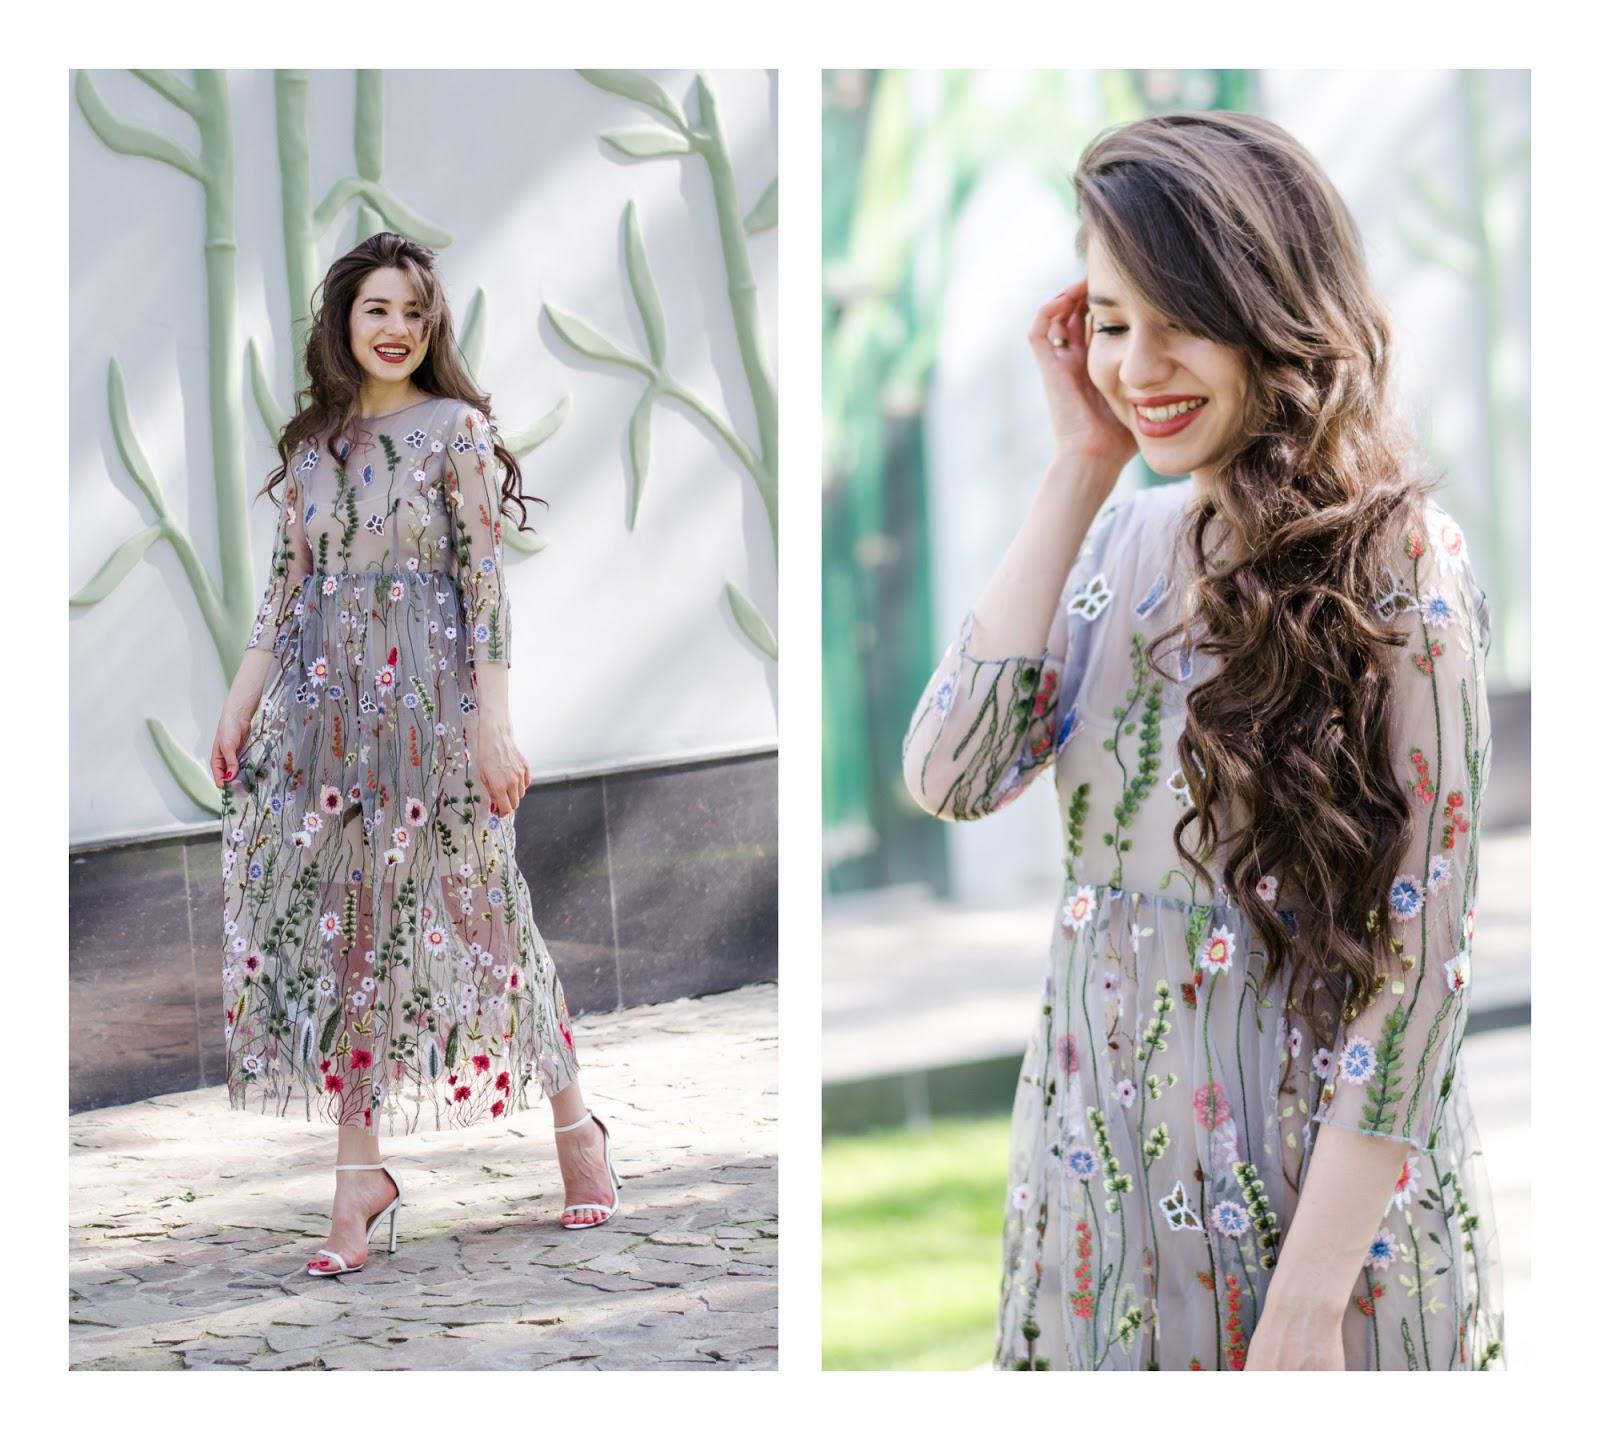 fashion blogger diyorasnotes diyora beta embroidery dress formal dress summer dress heeled sandals